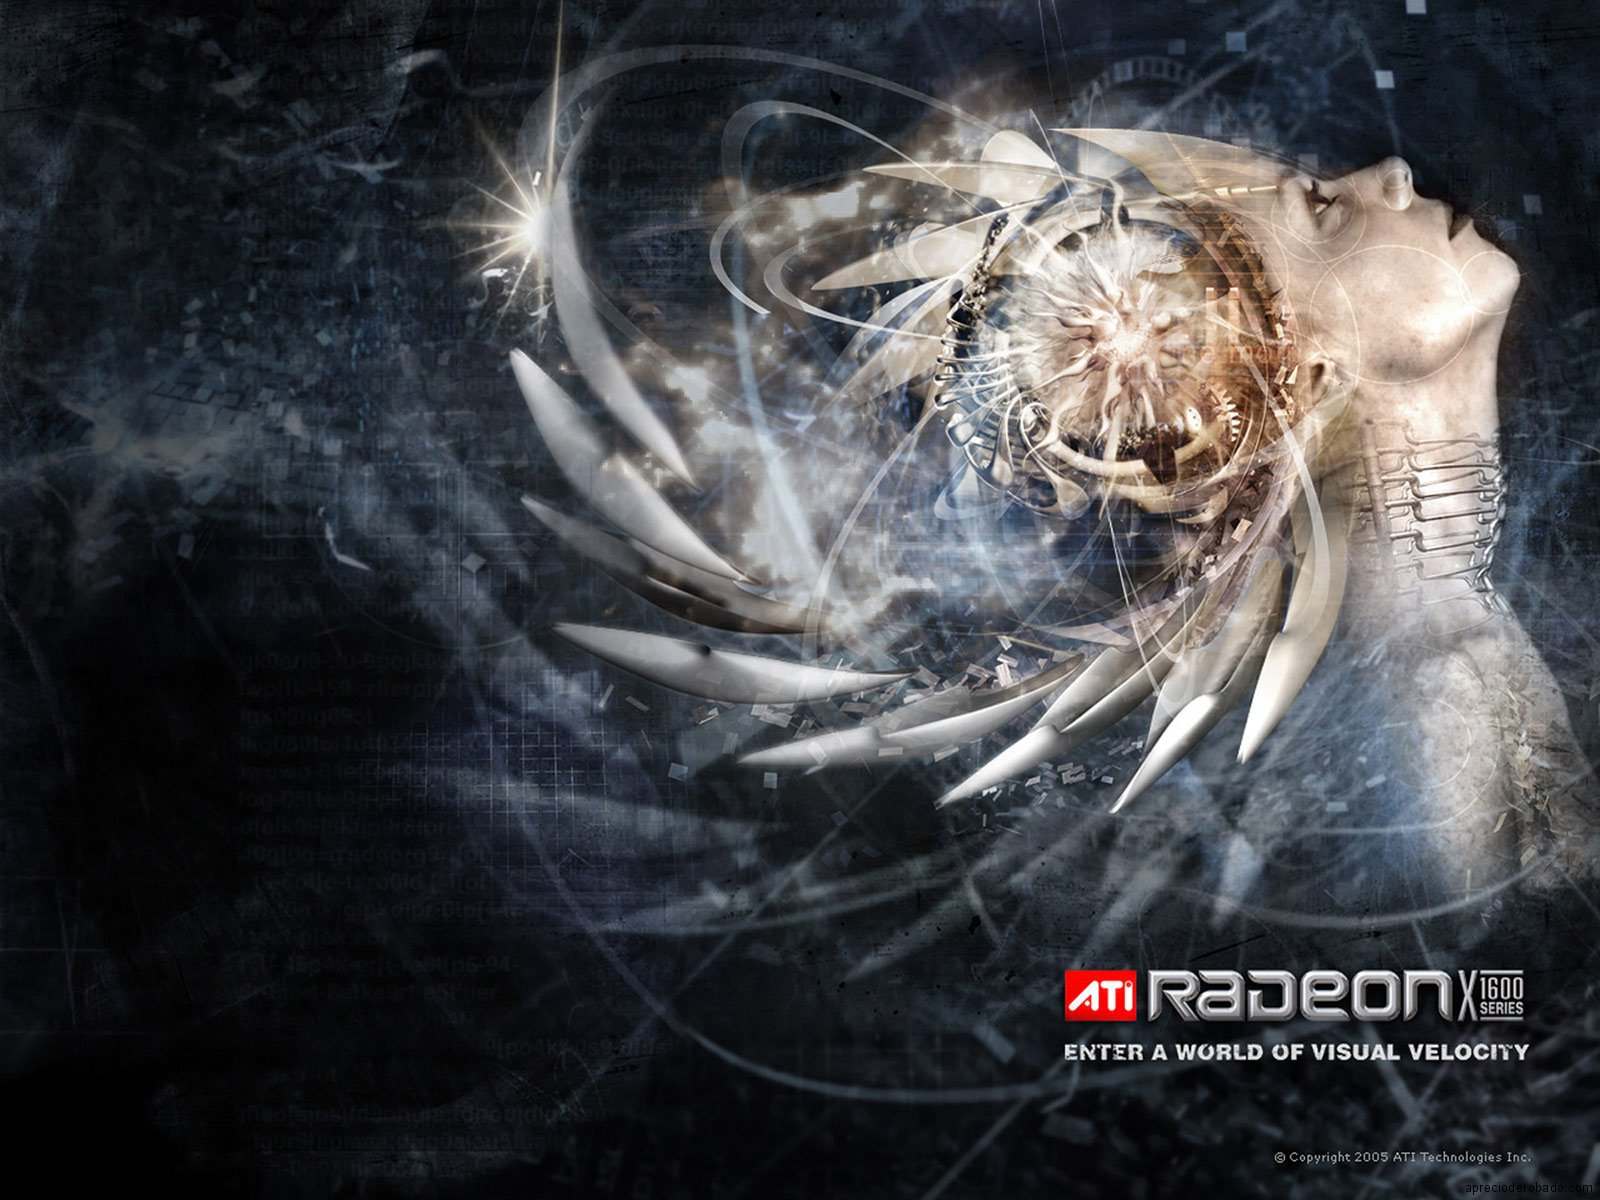 http://1.bp.blogspot.com/_QU8E4UZC7k4/TFZtzzUJfAI/AAAAAAAAADU/_do--Hz1idk/s1600/ATI_Radeon_X1600.jpg